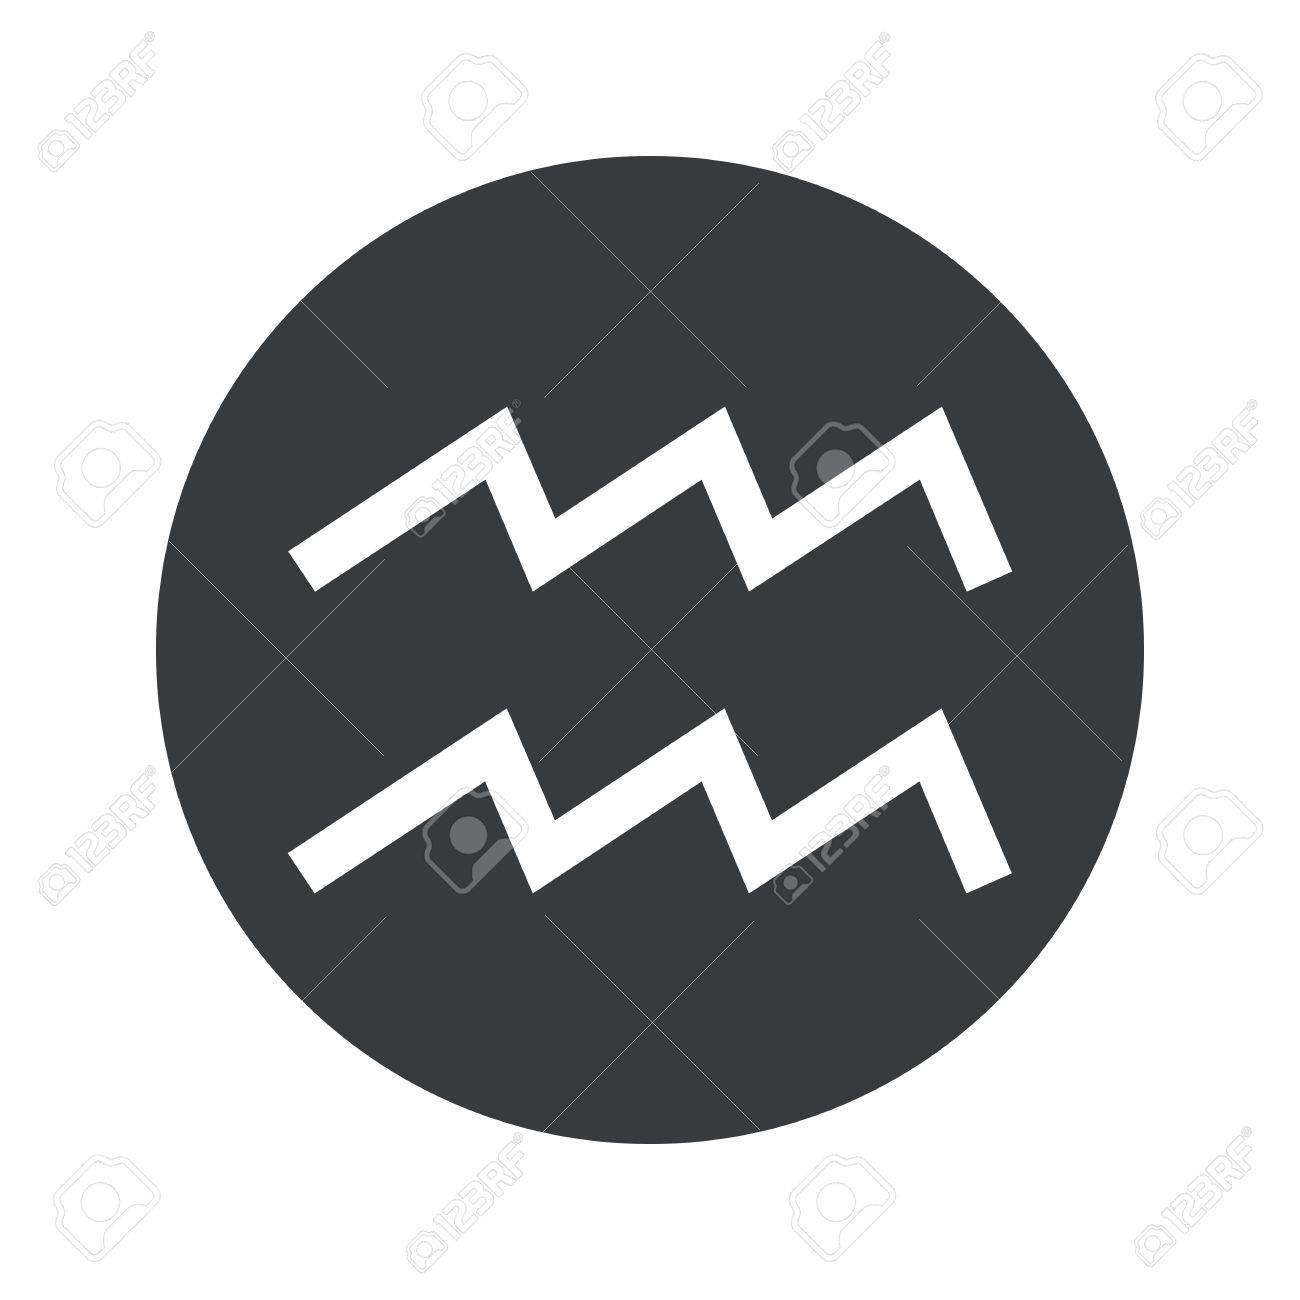 Image of aquarius zodiac symbol in black circle isolated on image of aquarius zodiac symbol in black circle isolated on white stock vector 41860997 biocorpaavc Image collections